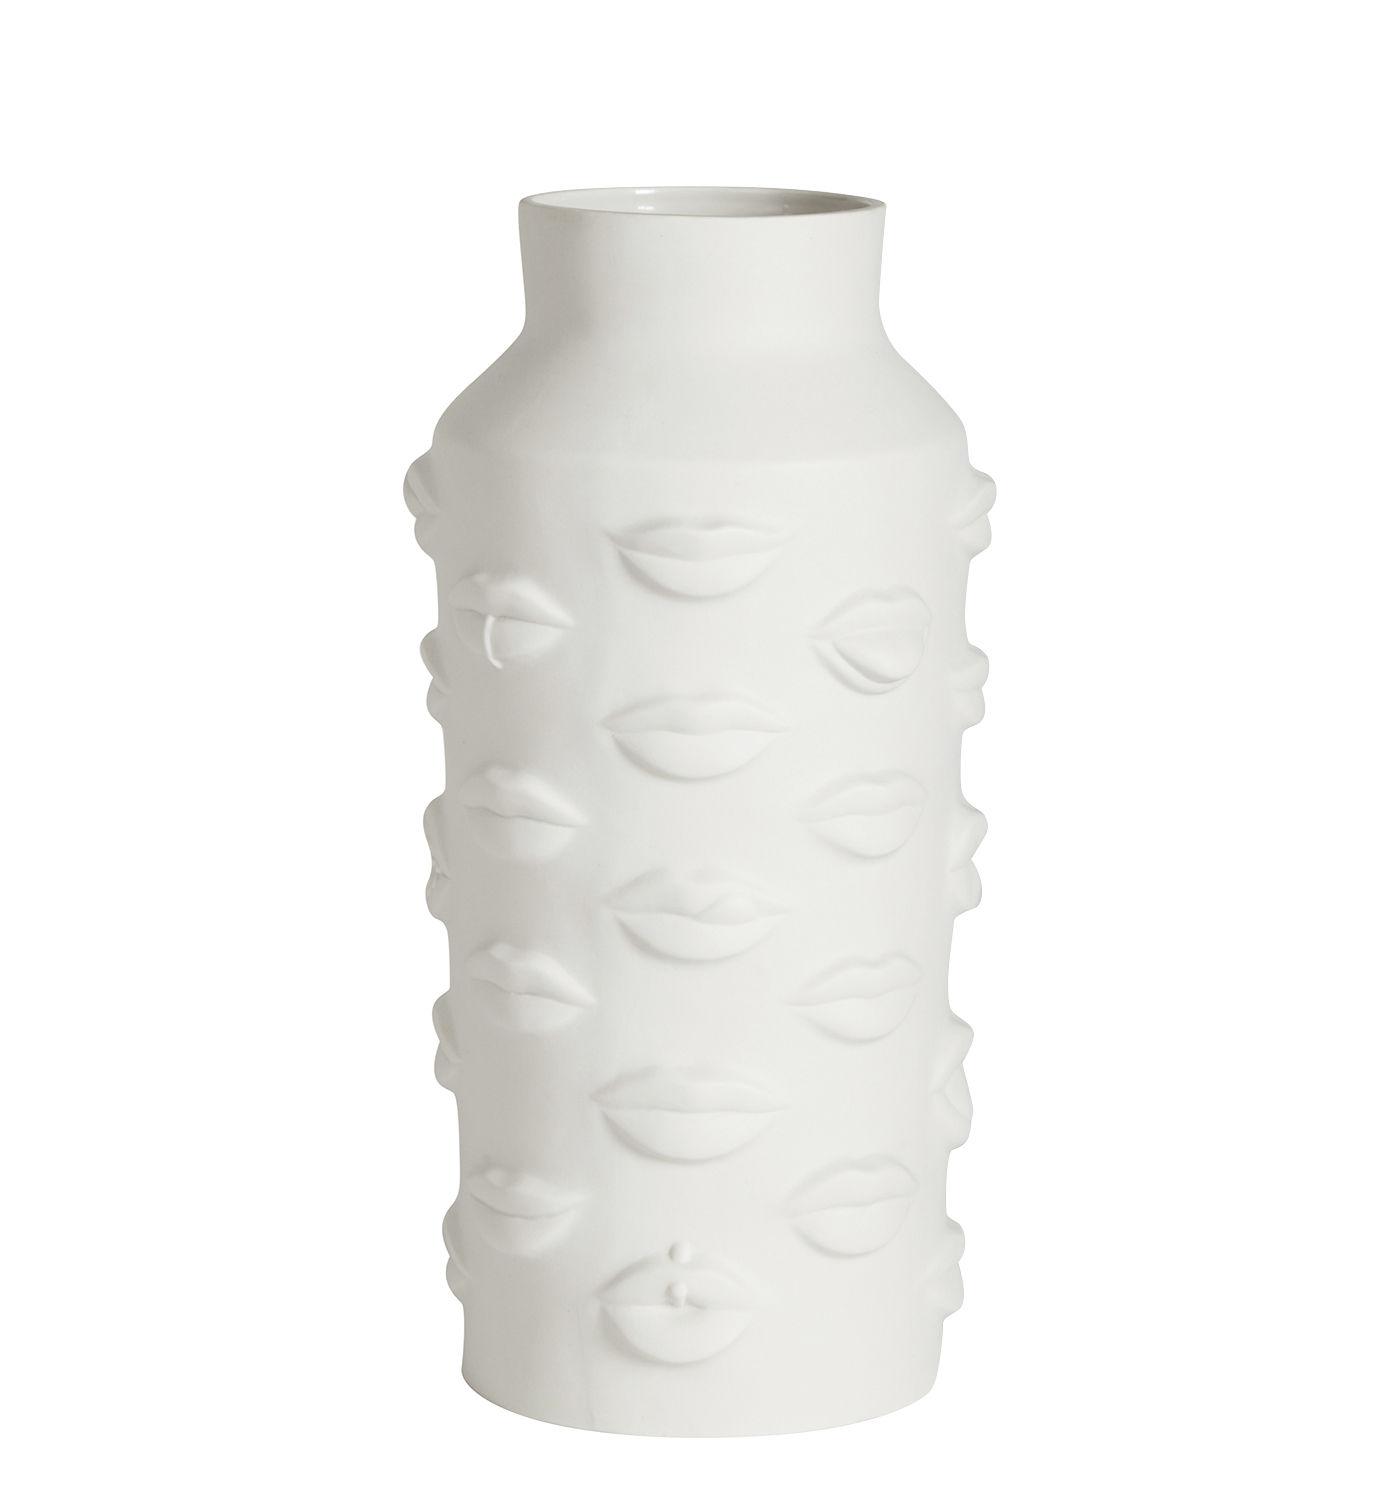 Decoration - Vases - Giant Gala Vase Vase by Jonathan Adler - White - China